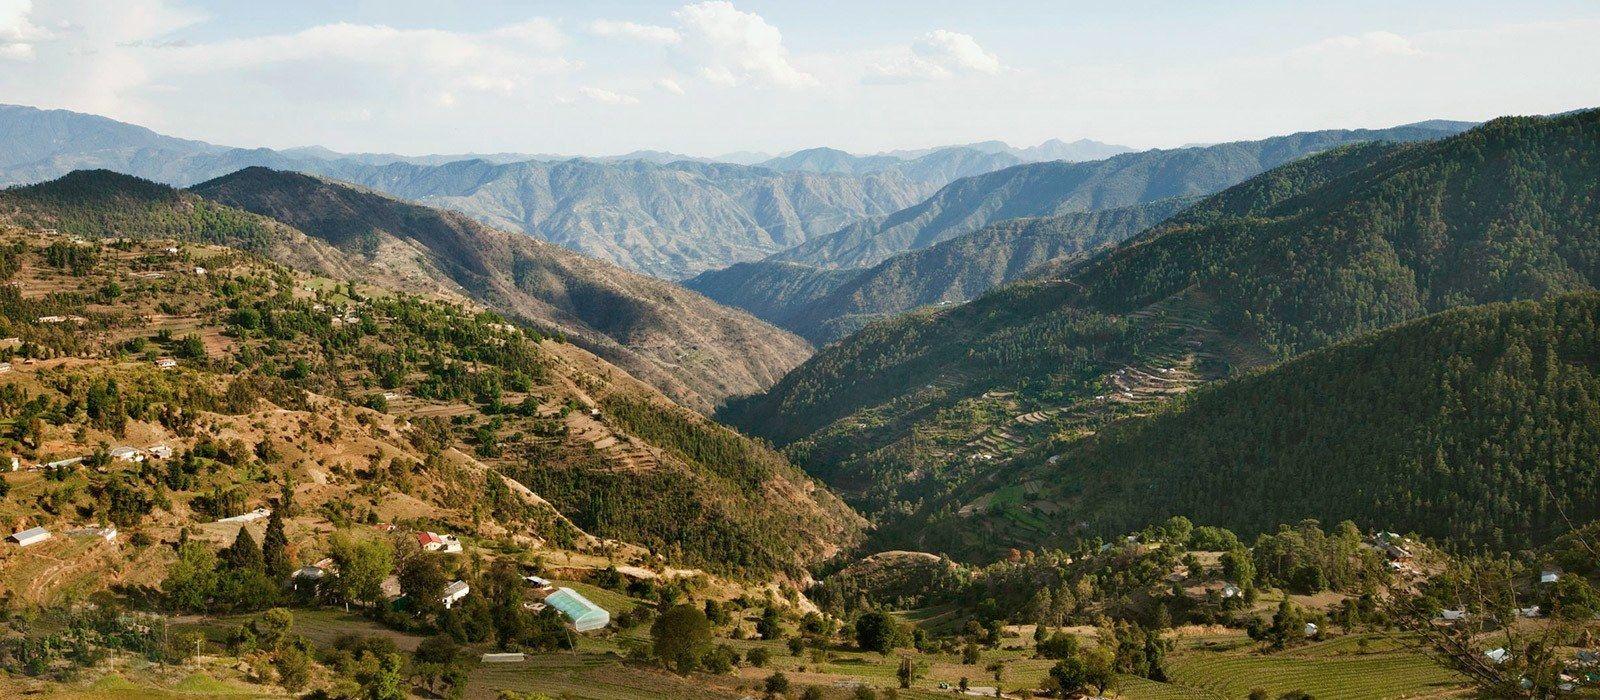 Das The Oberoi Hotels & Resorts Sommerangebot: Im Himalaya Gebirge Urlaub 1